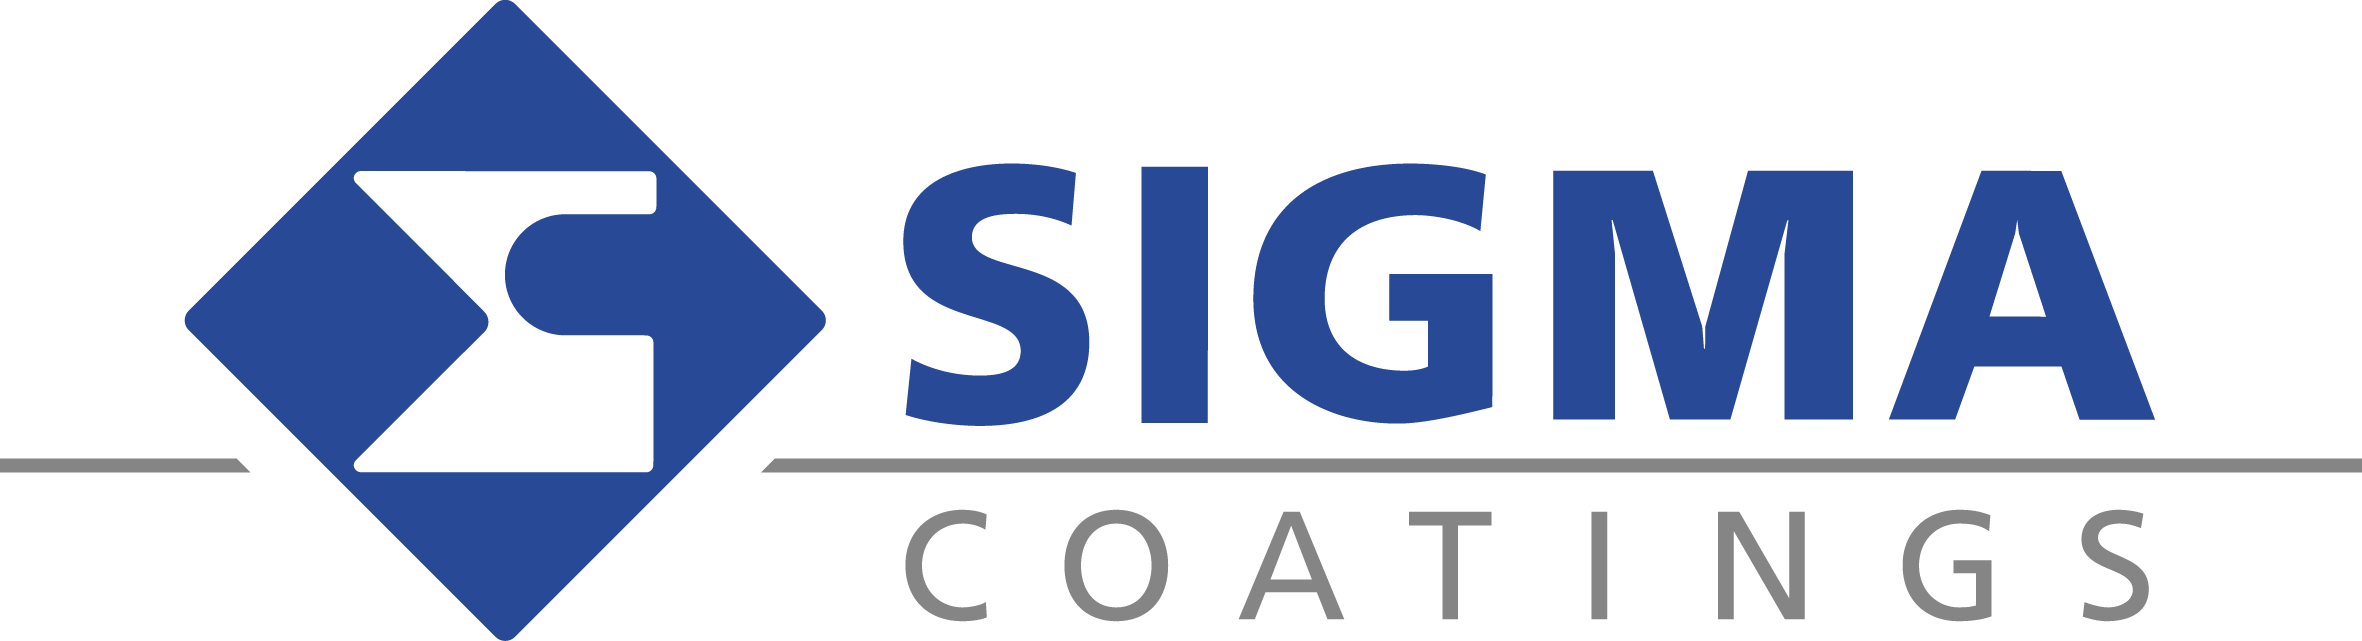 Sigma Coatings Logo Standard Grey